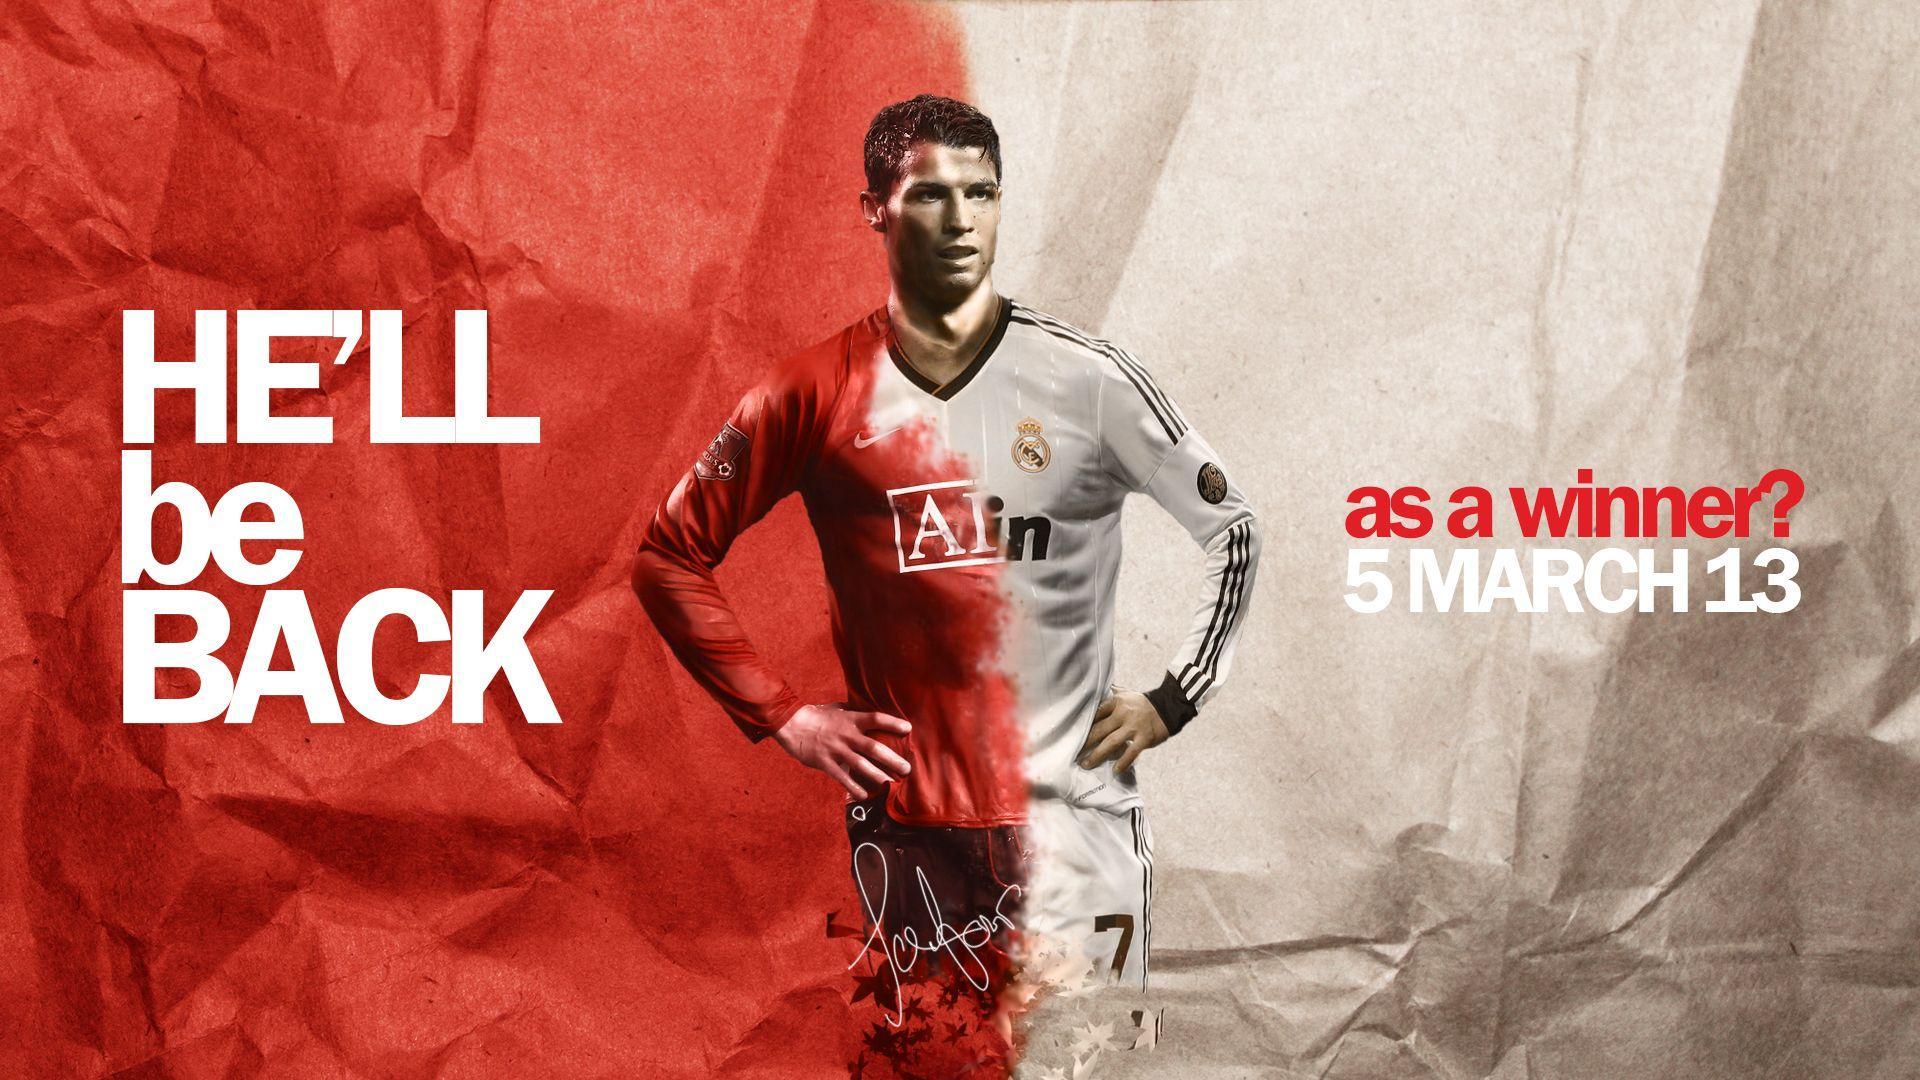 Cristiano Ronaldo HD Wallpaper MixHD wallpapers | IMAGEIF